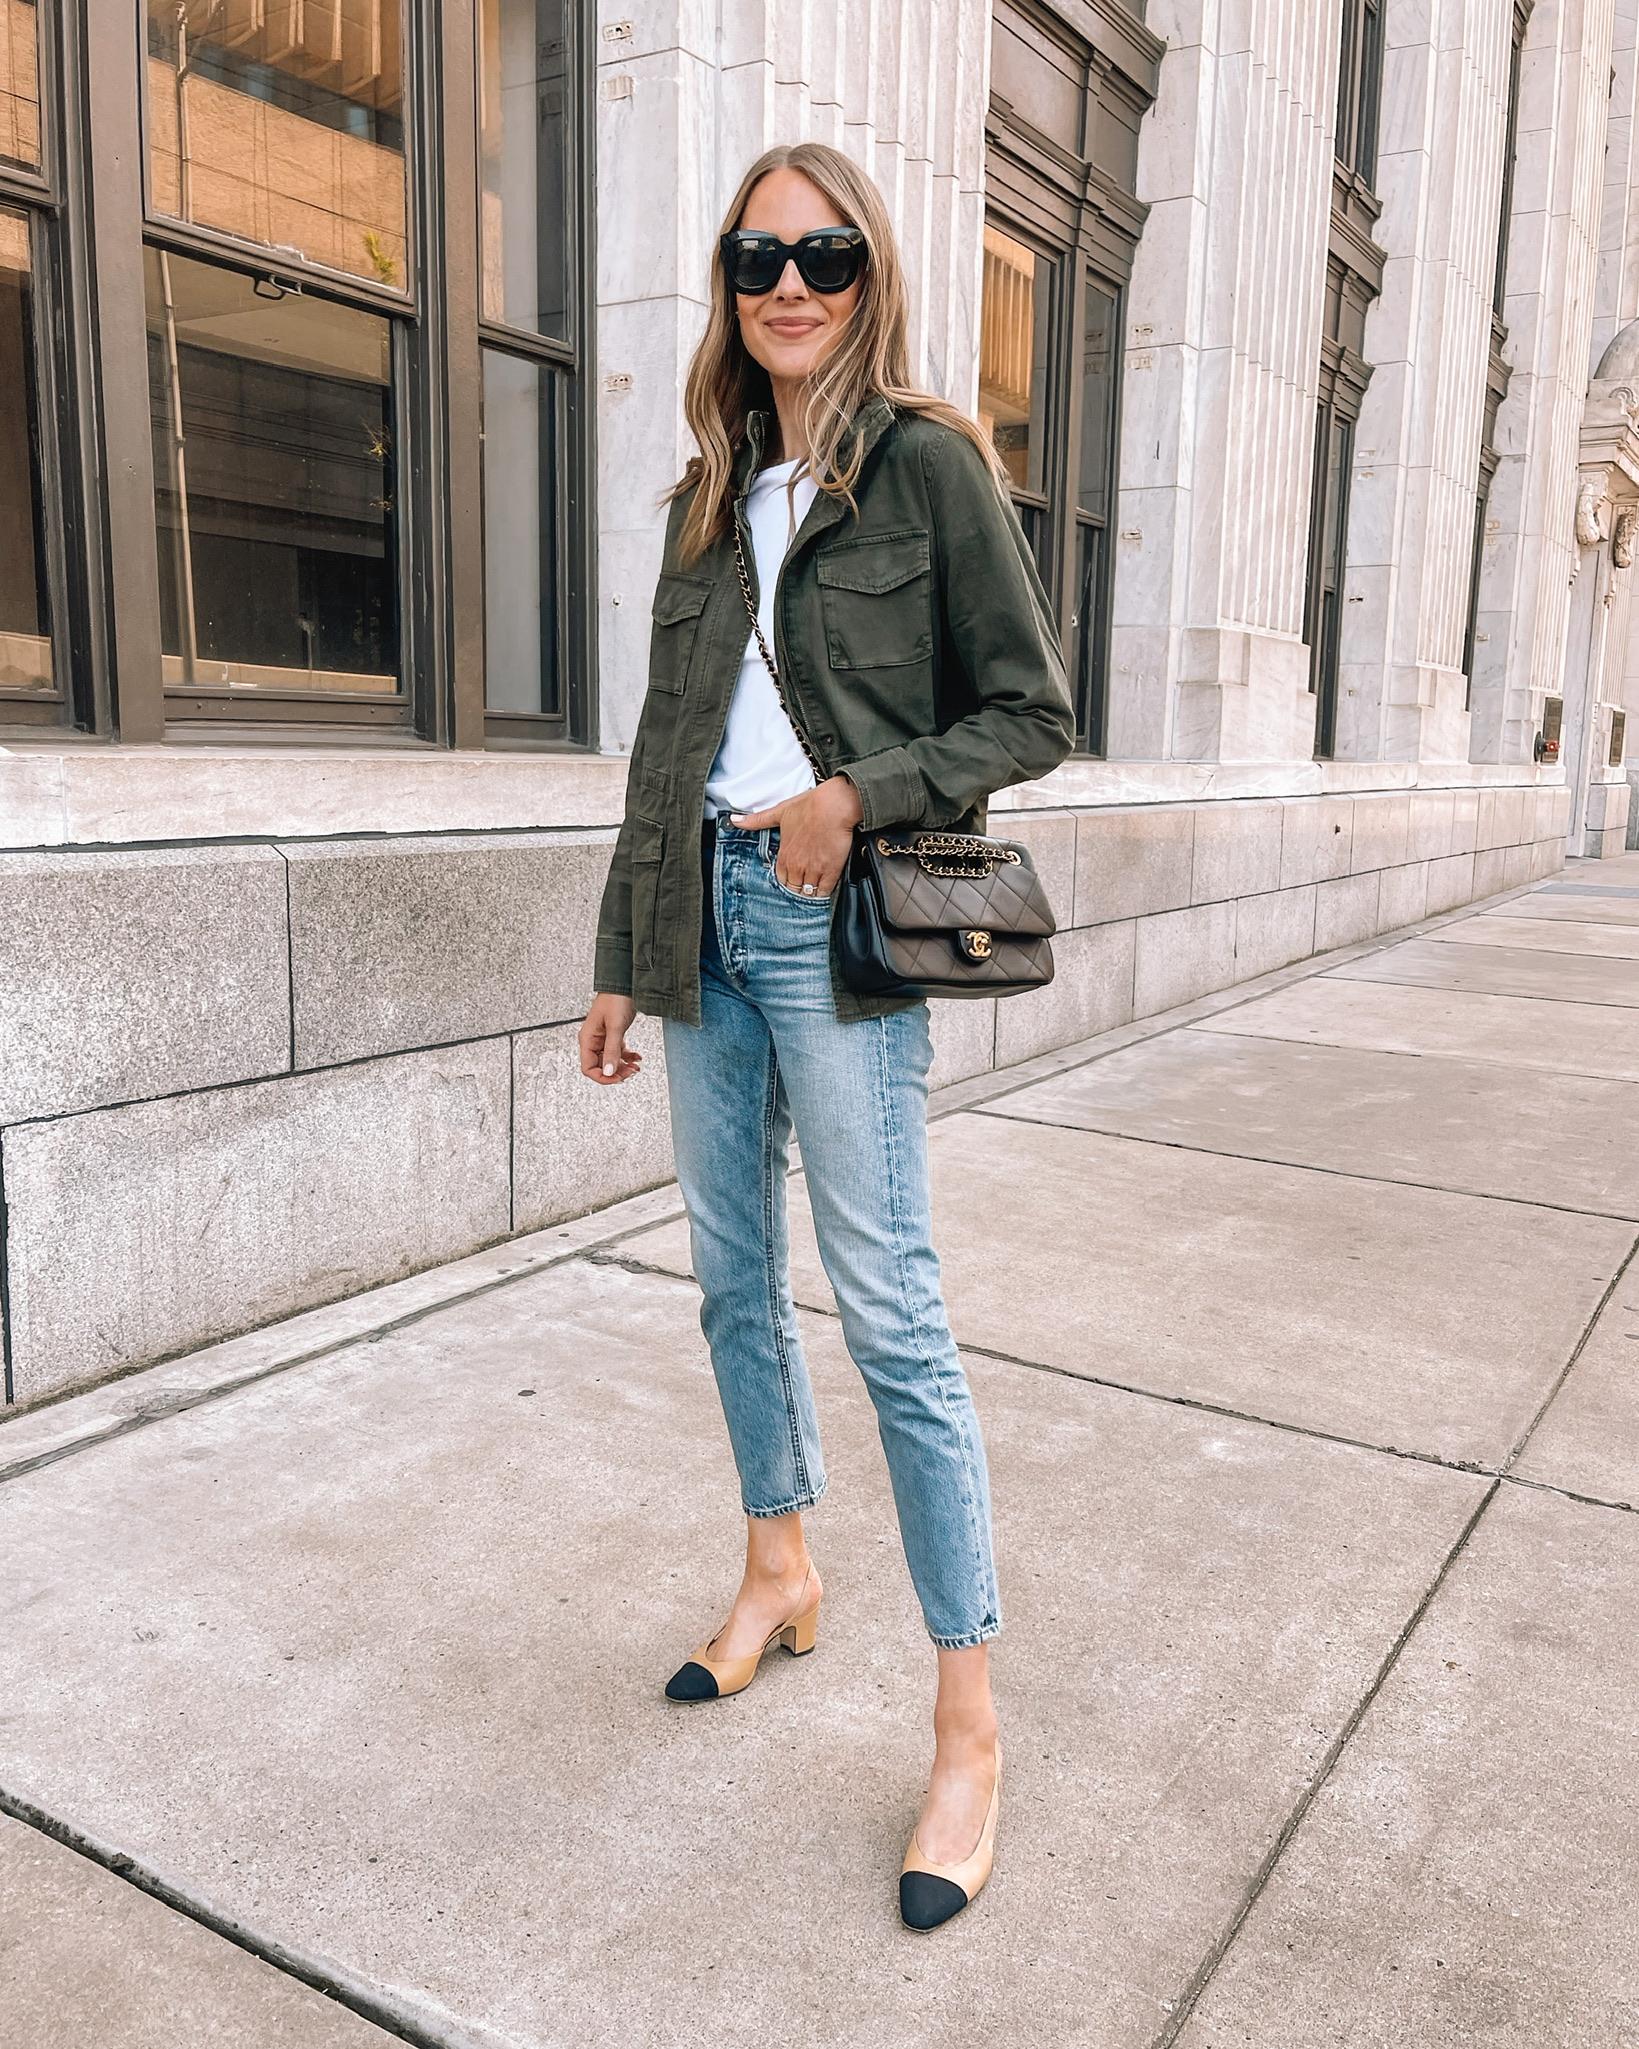 Fashion Jackson Wearing Amazon Fashion Green Utility Jacket Citizens of Humanity Jeans Chanel Slingbacks